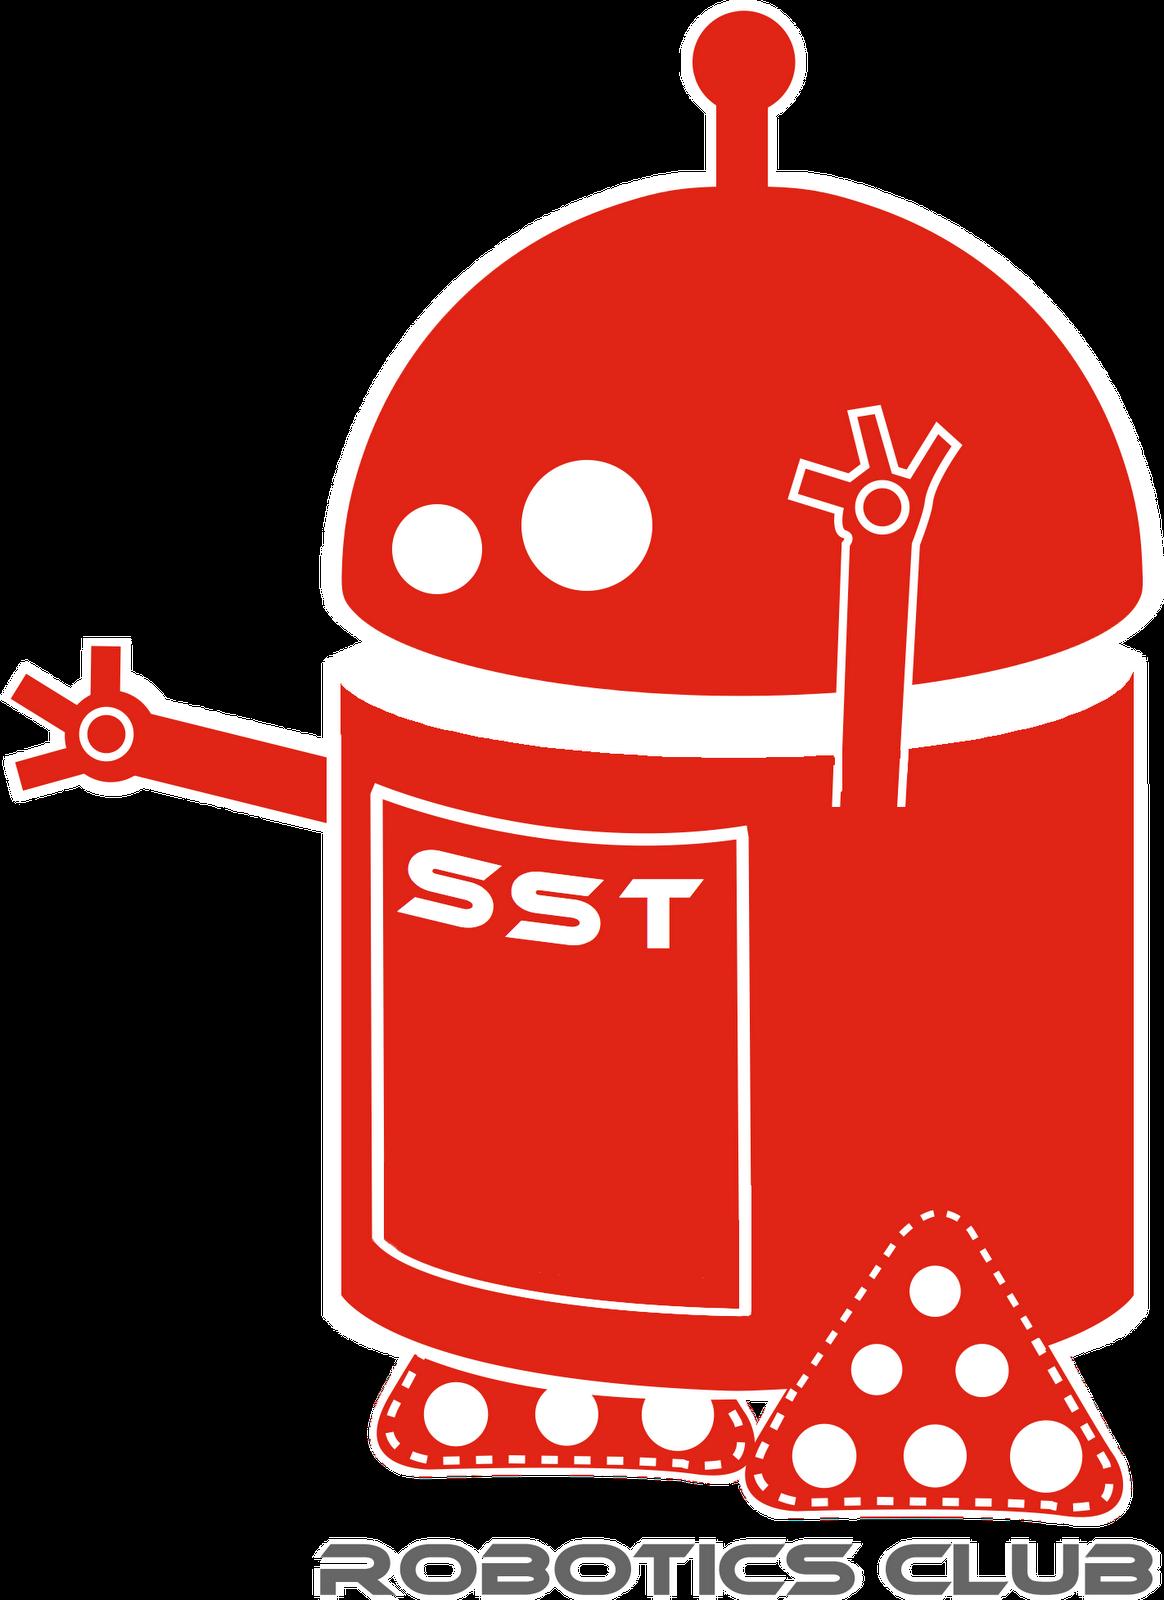 Robotics Logo Club Robotics Robotics Club Logo Science